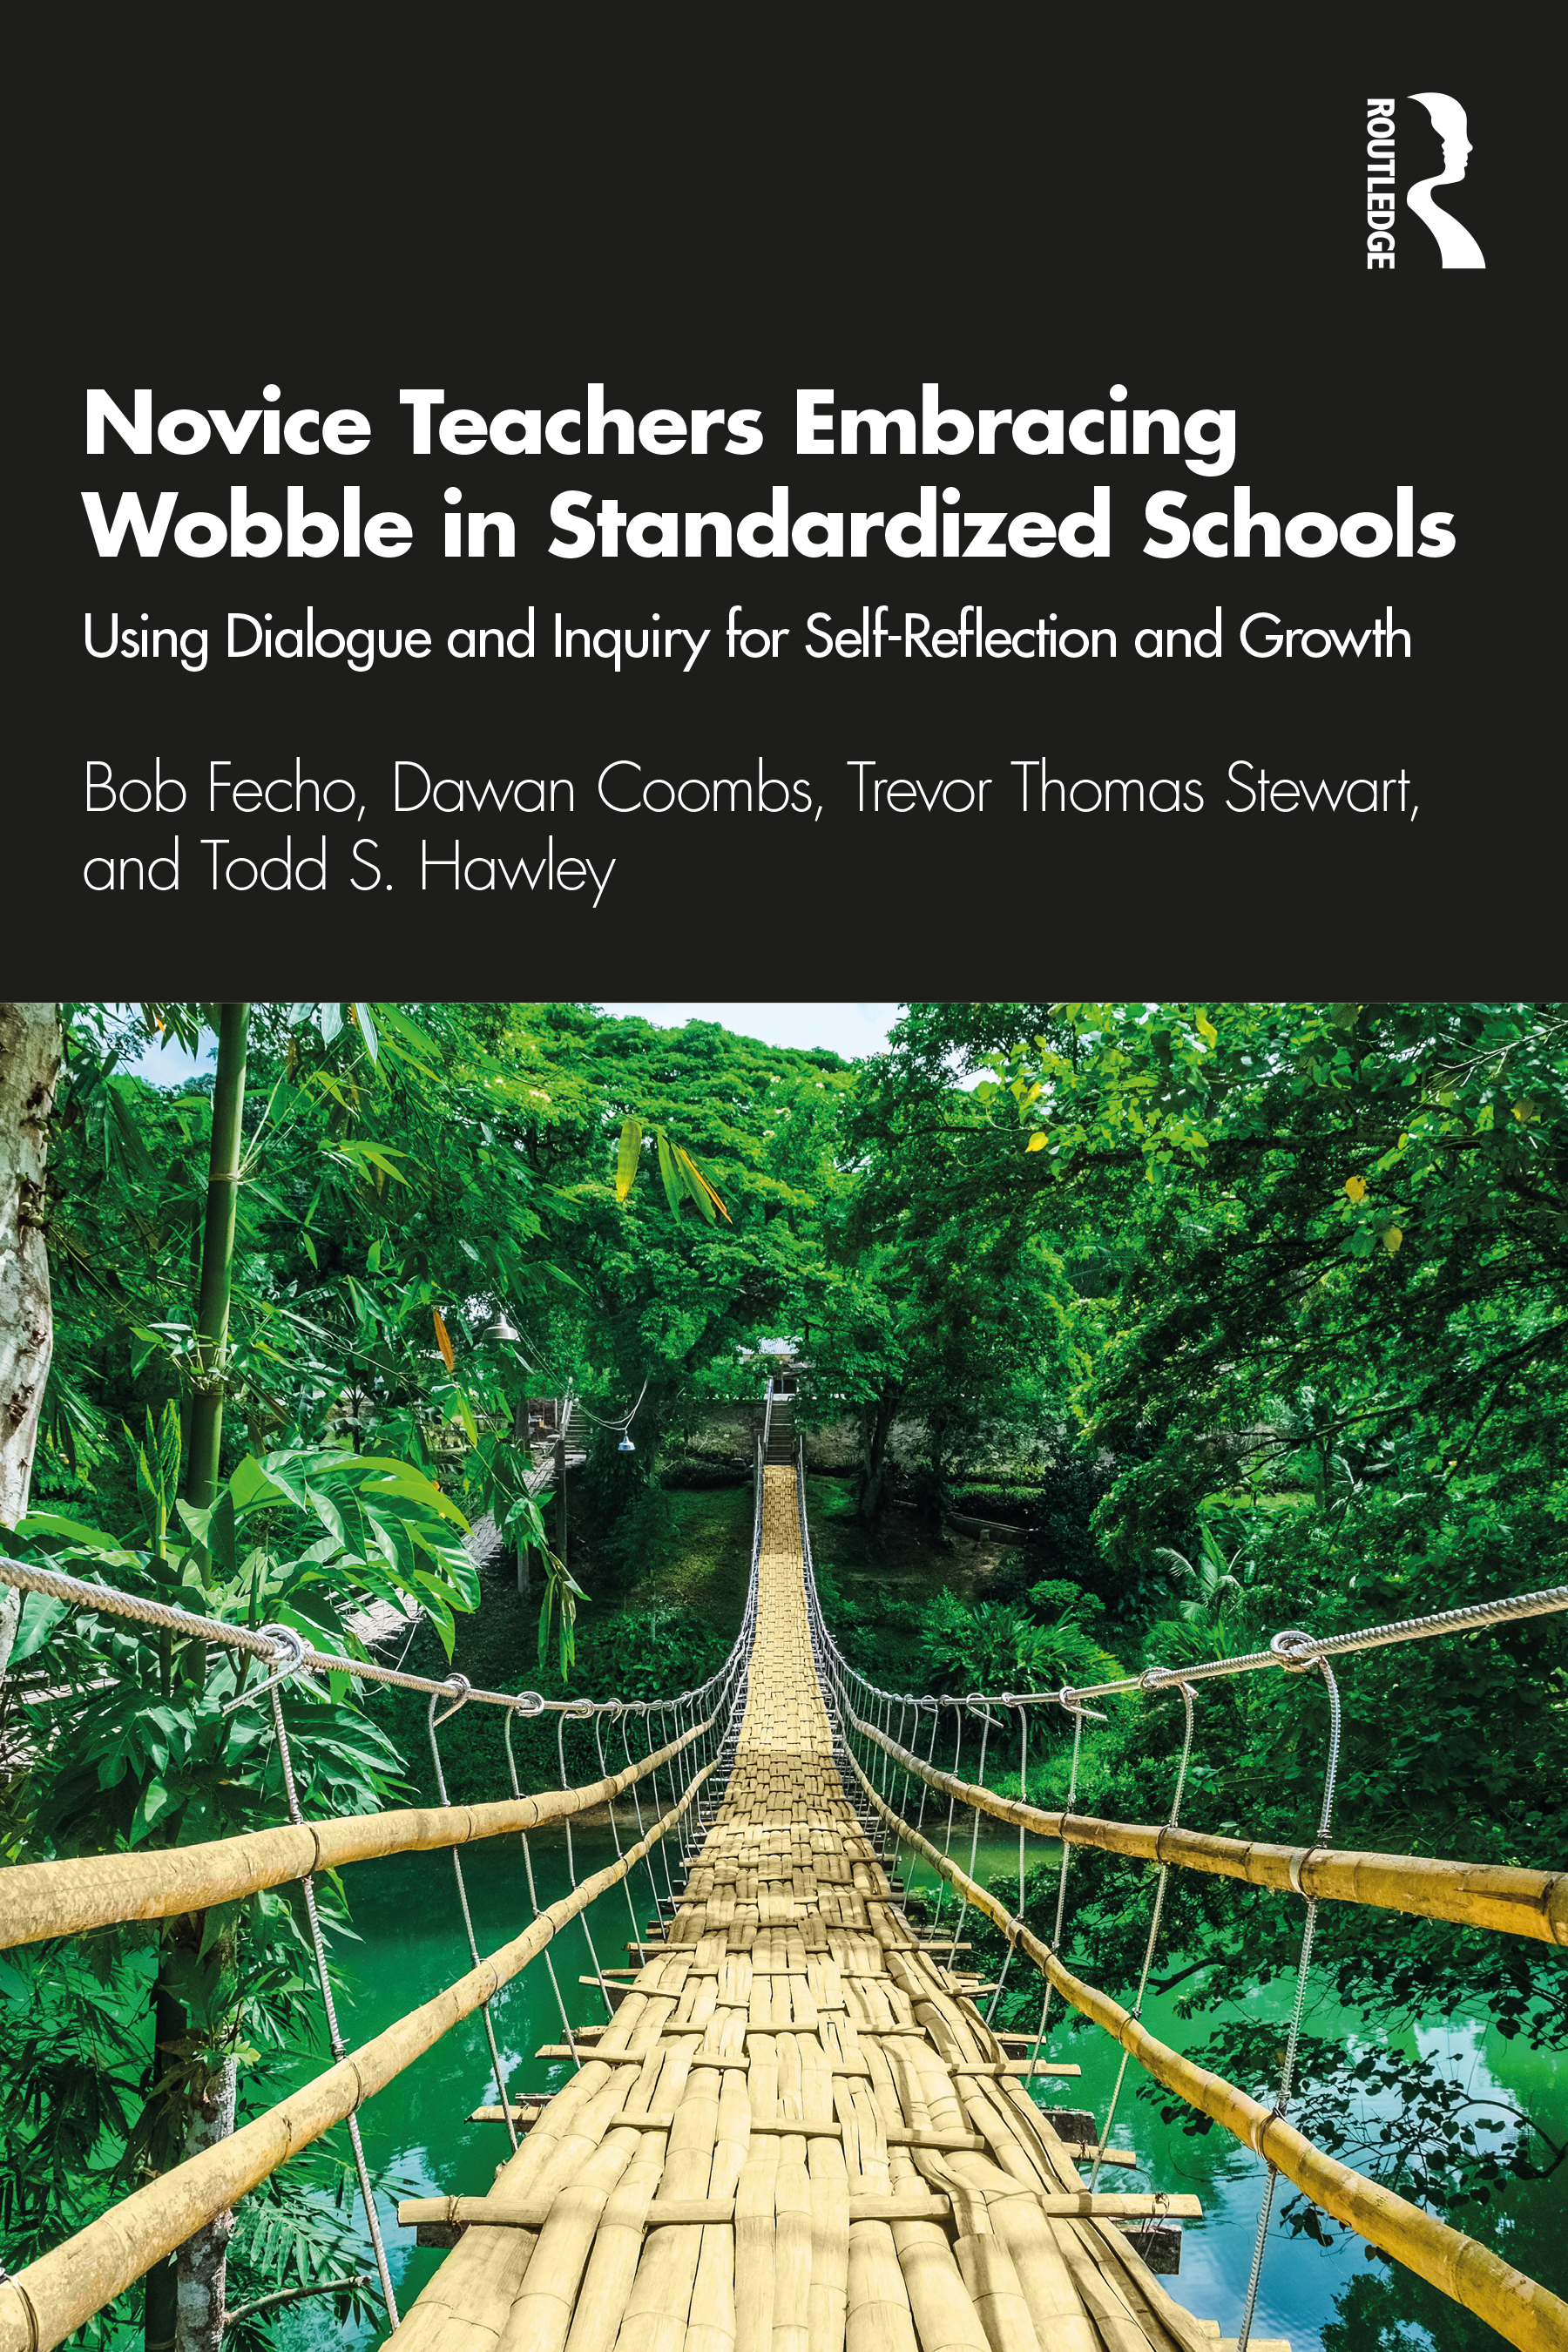 Novice Teachers Embracing Wobble in Standardized Schools